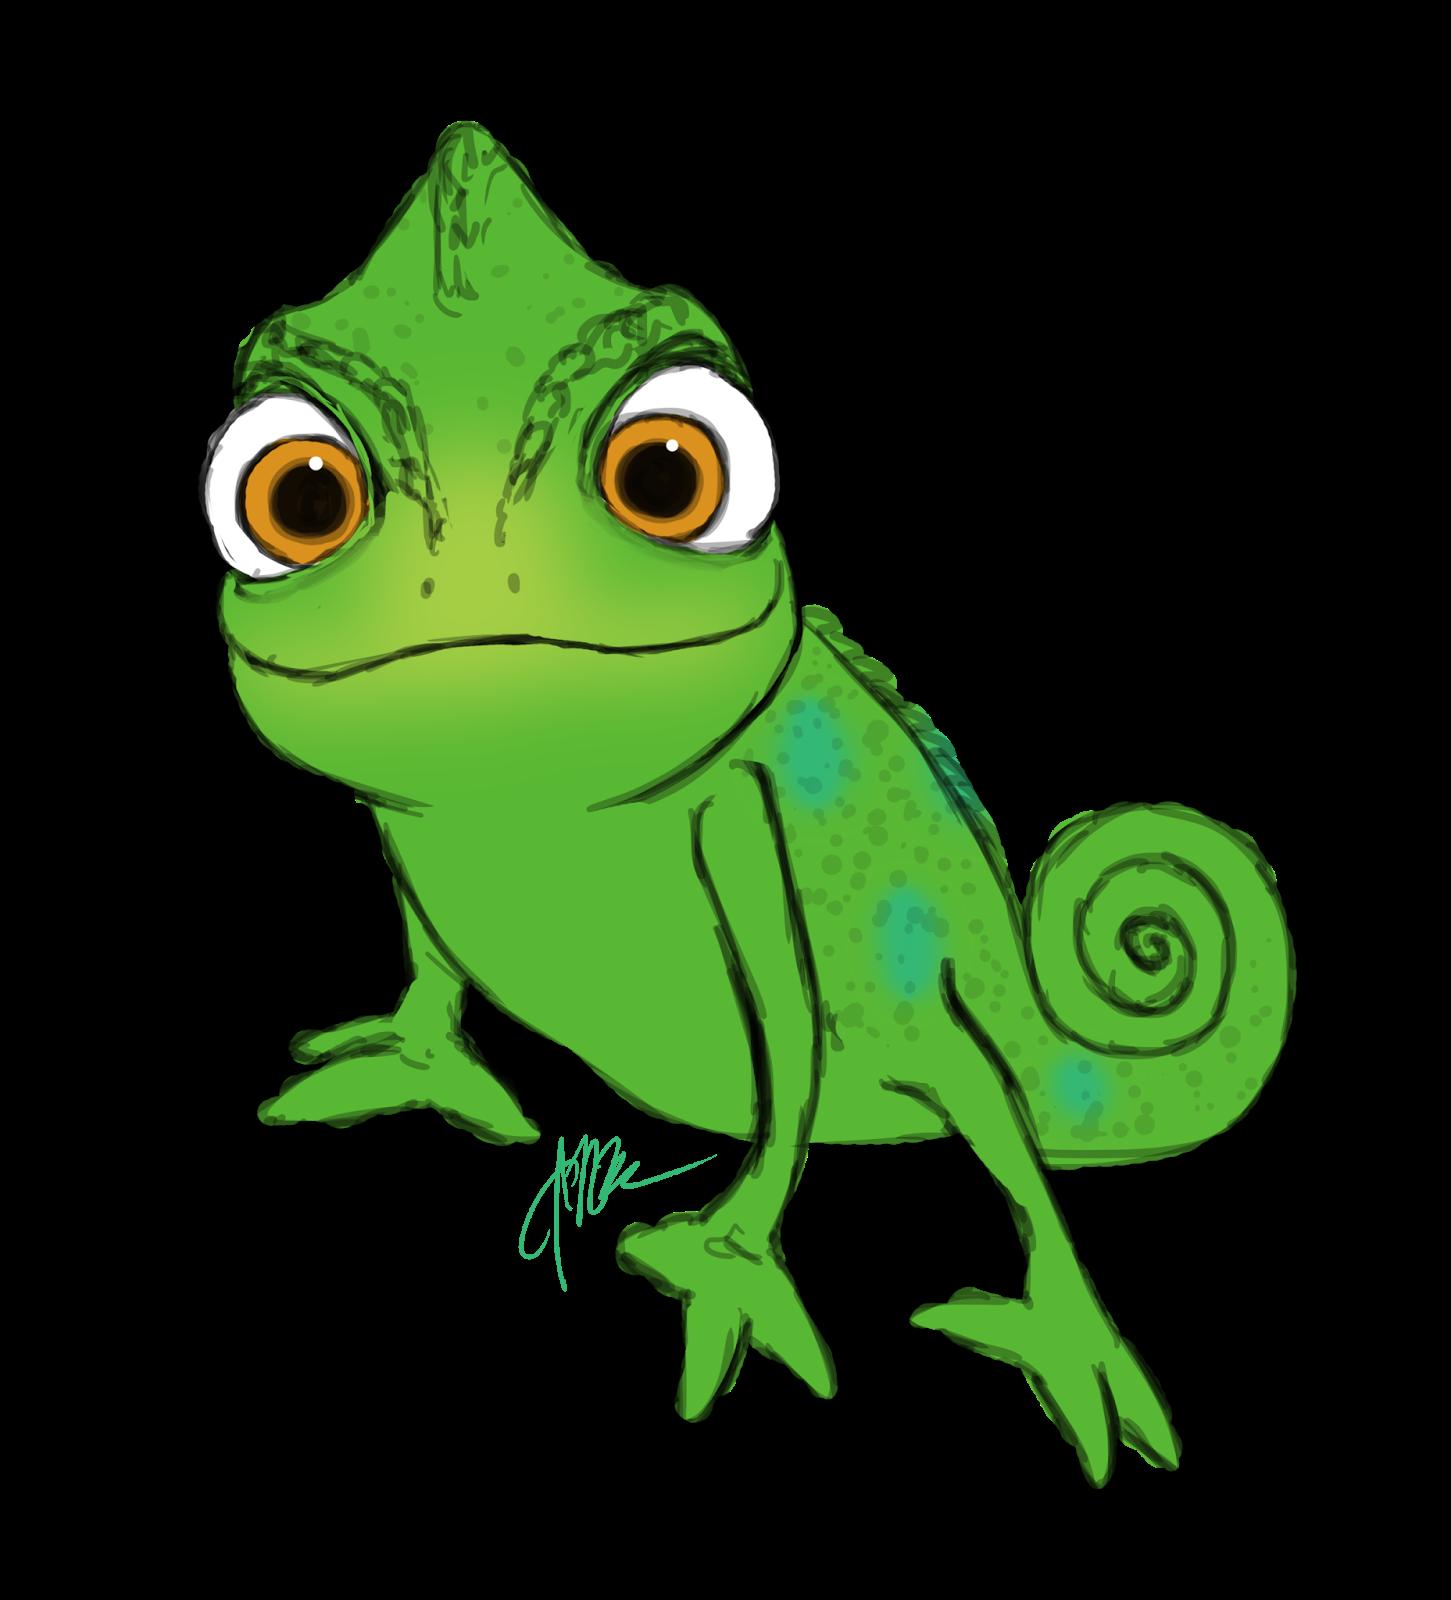 chameleon clipart rapunzel pascal chameleon rapunzel